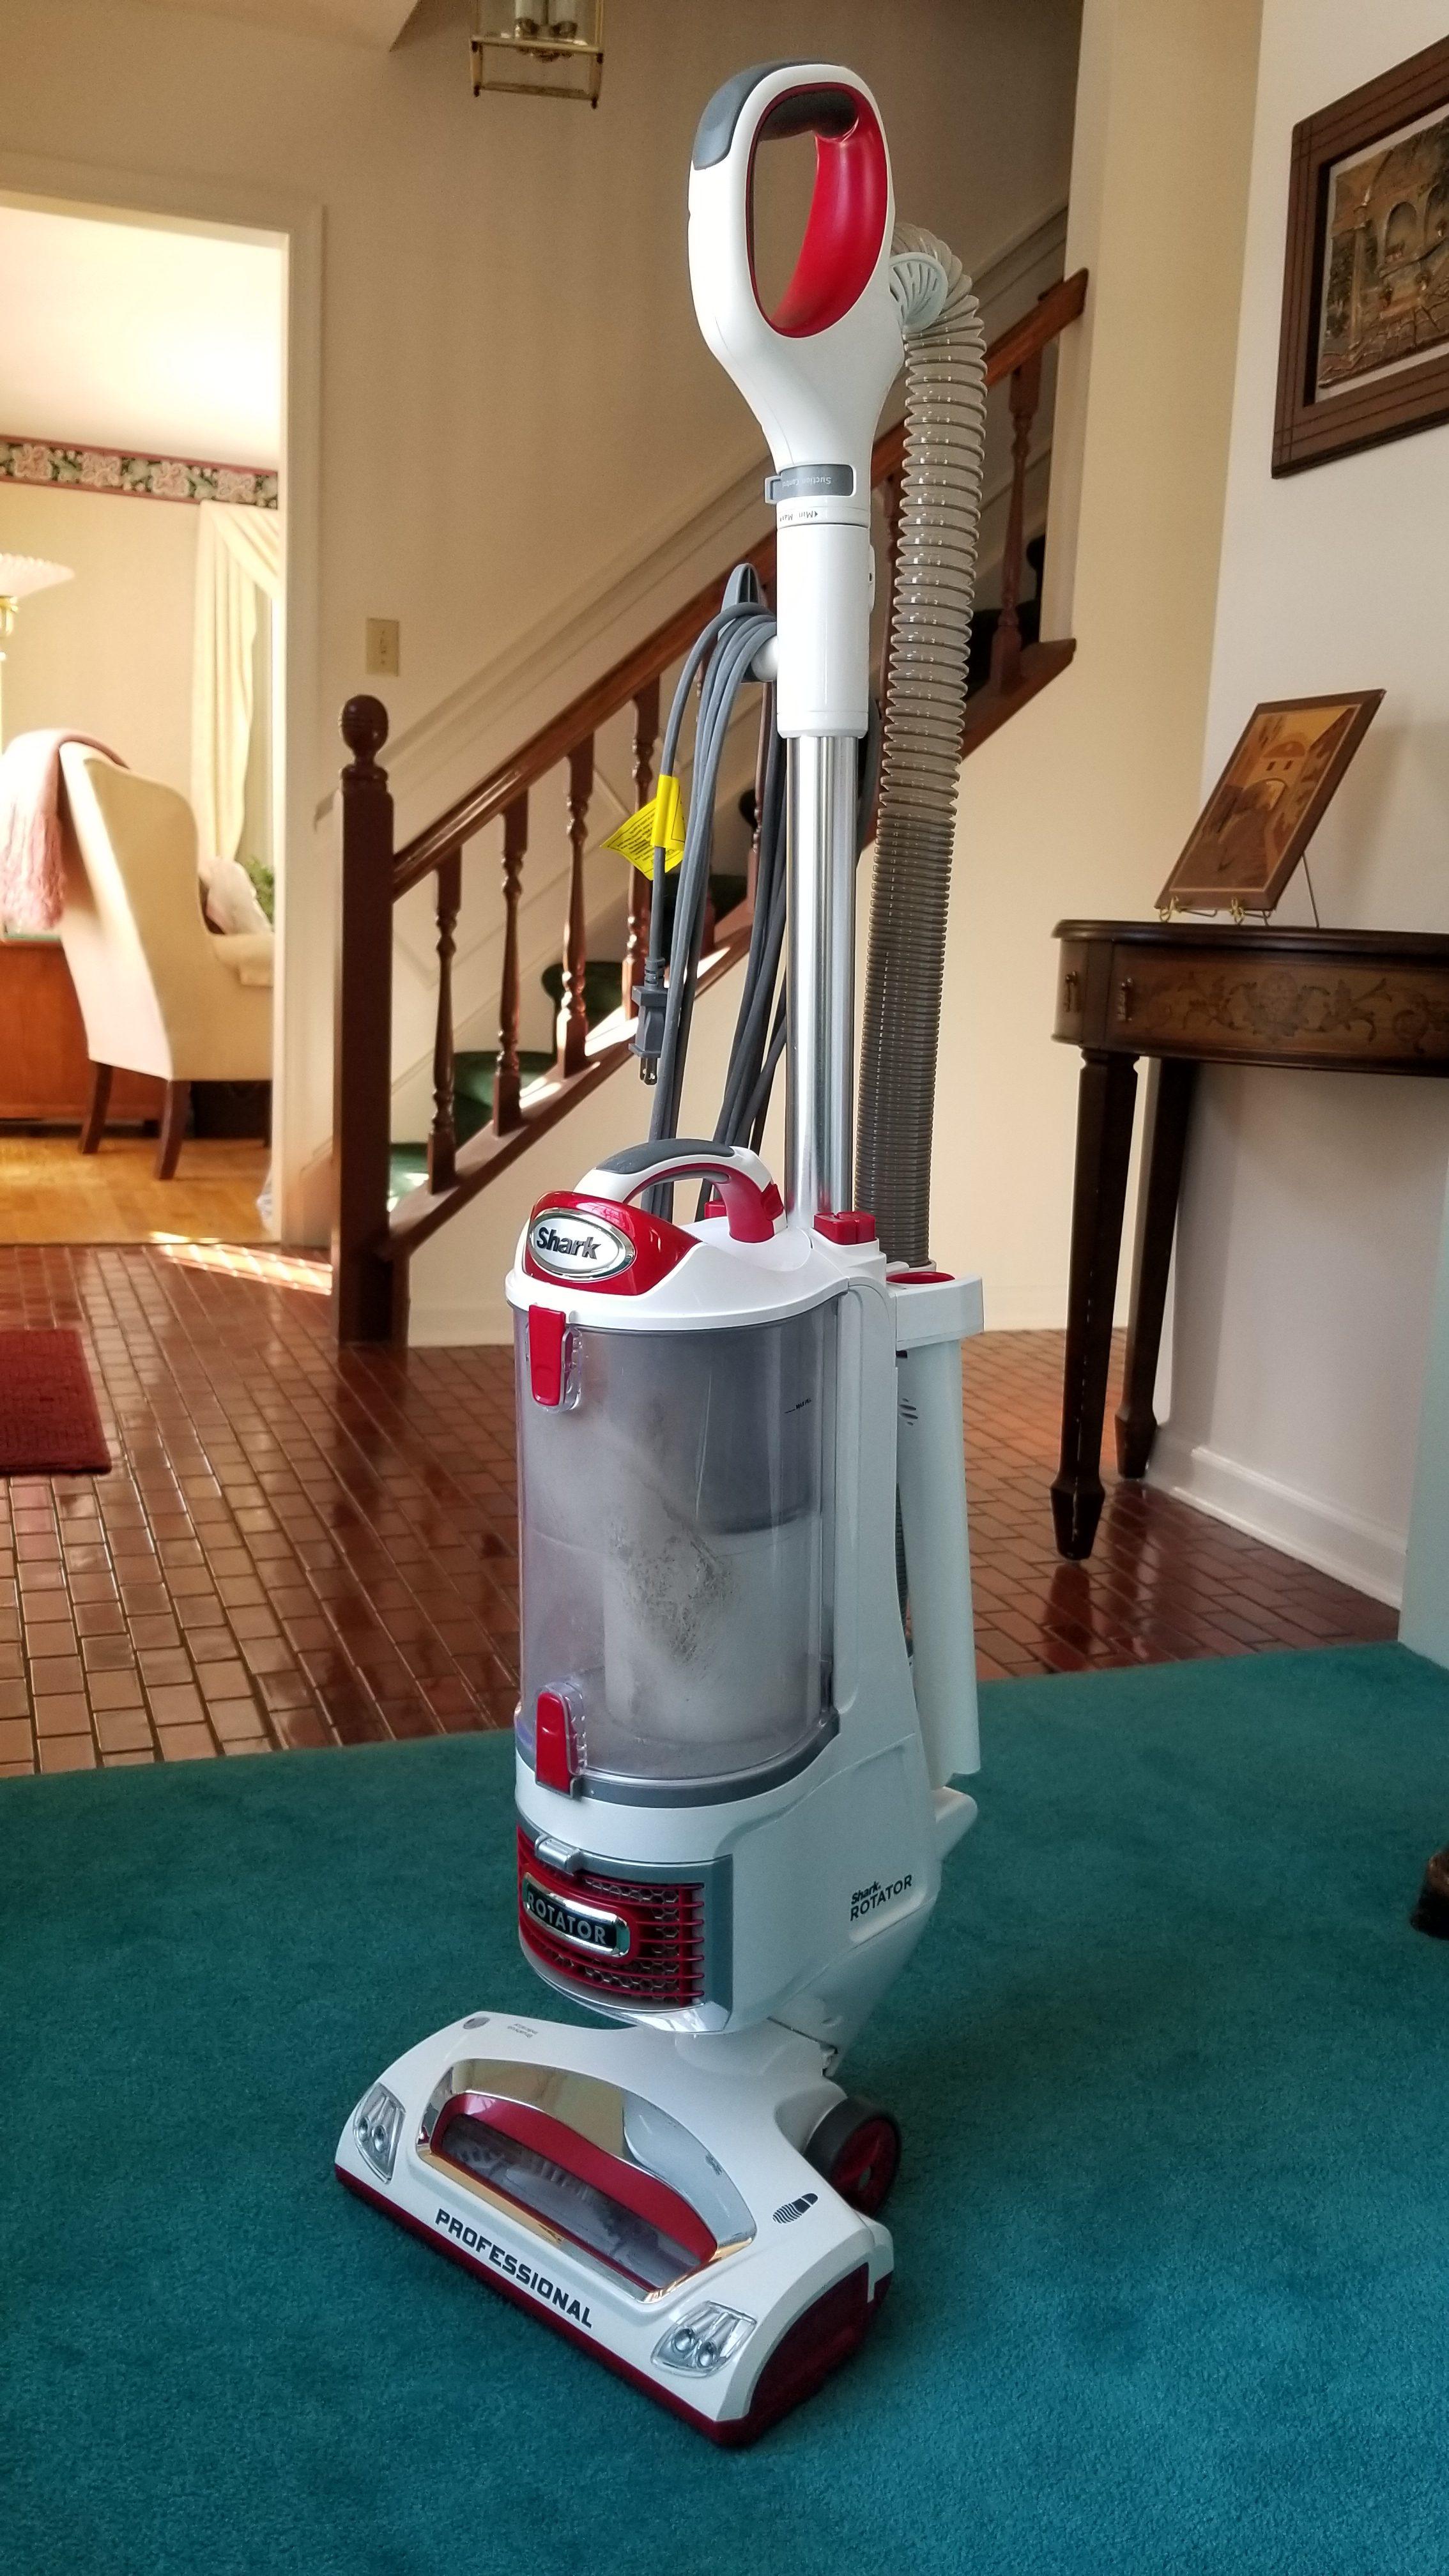 New Shark Rotator Professional Lift-Away Vacuum NV501